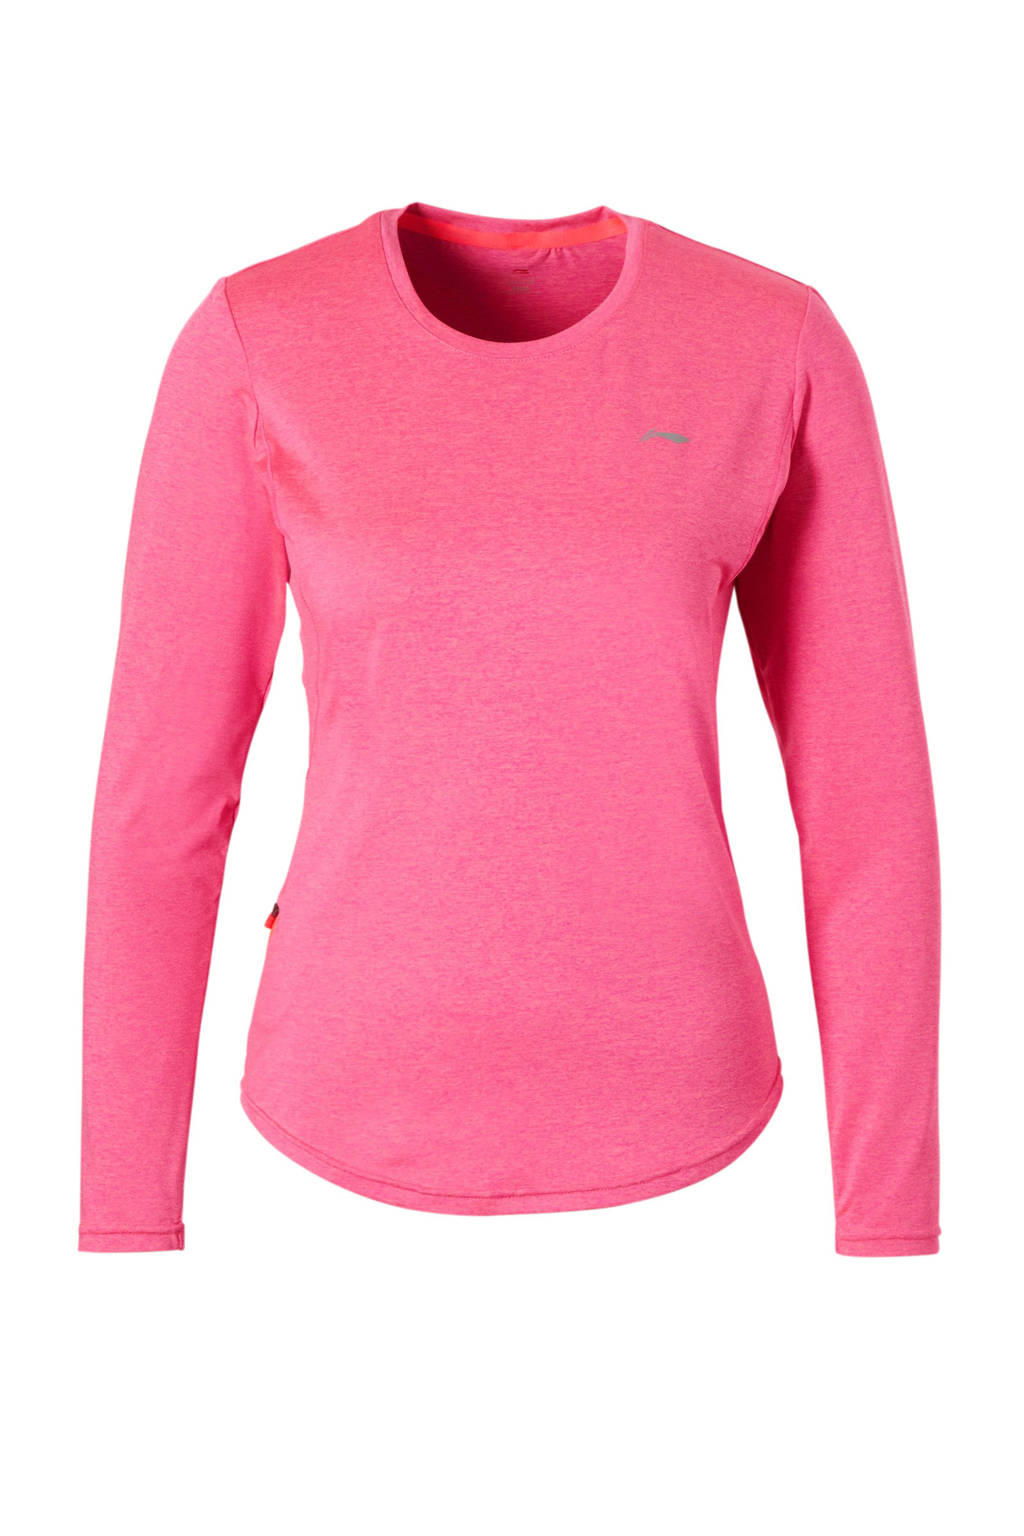 Li-Ning sport T-shirt roze, Roze